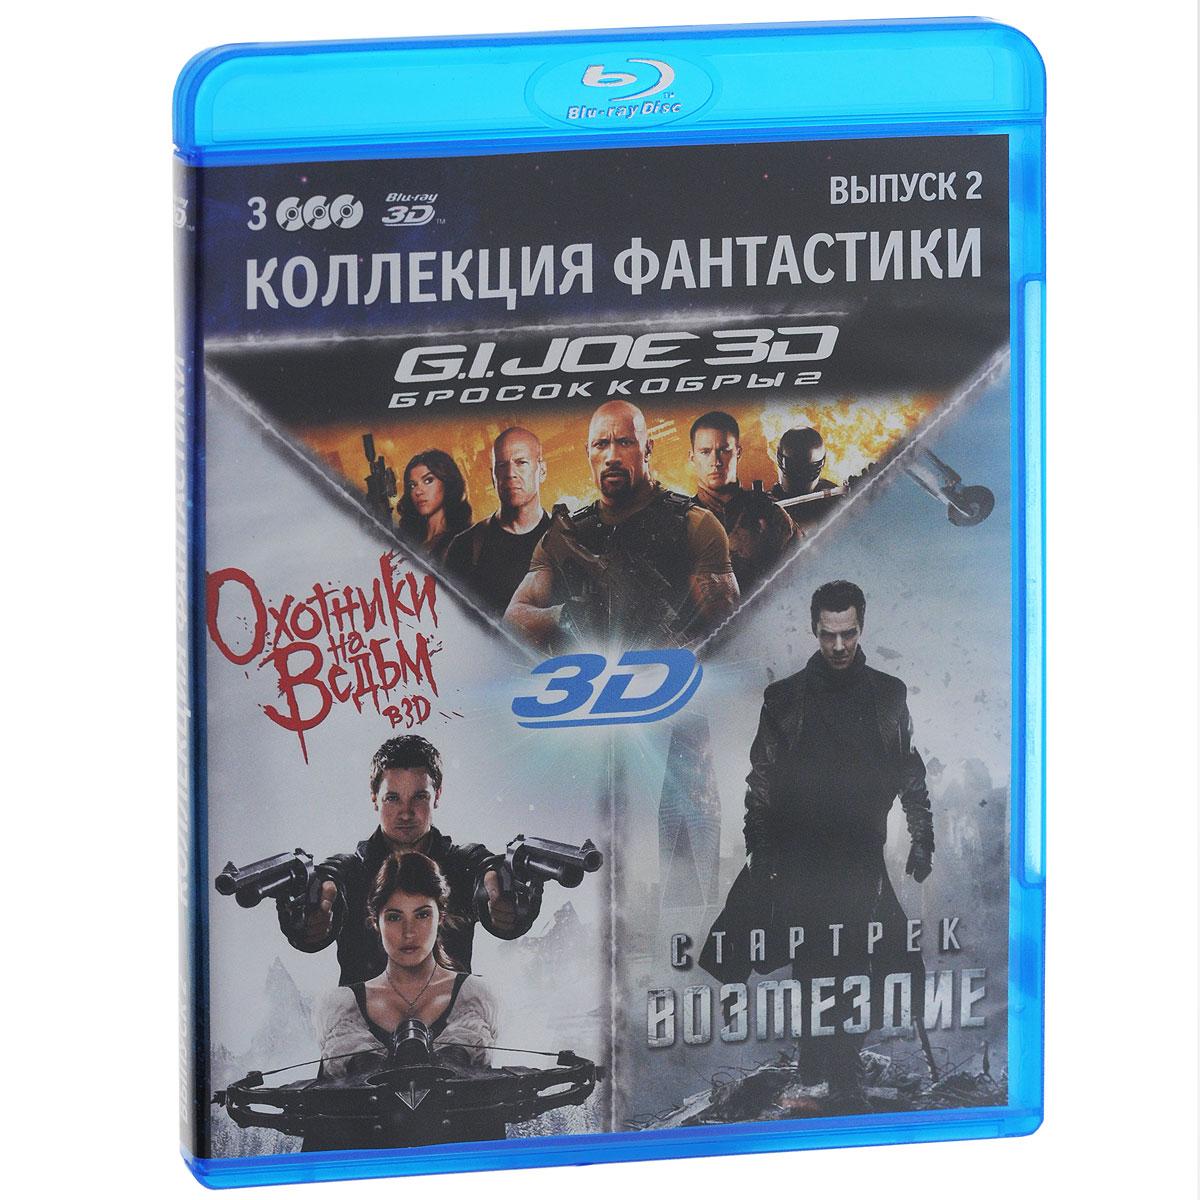 G.I. Joe: Бросок кобры 2 / Охотники на ведьм / Стартрек: Возмездие (3 Blu-ray) joe satriani satchurated live in montreal 3d blu ray